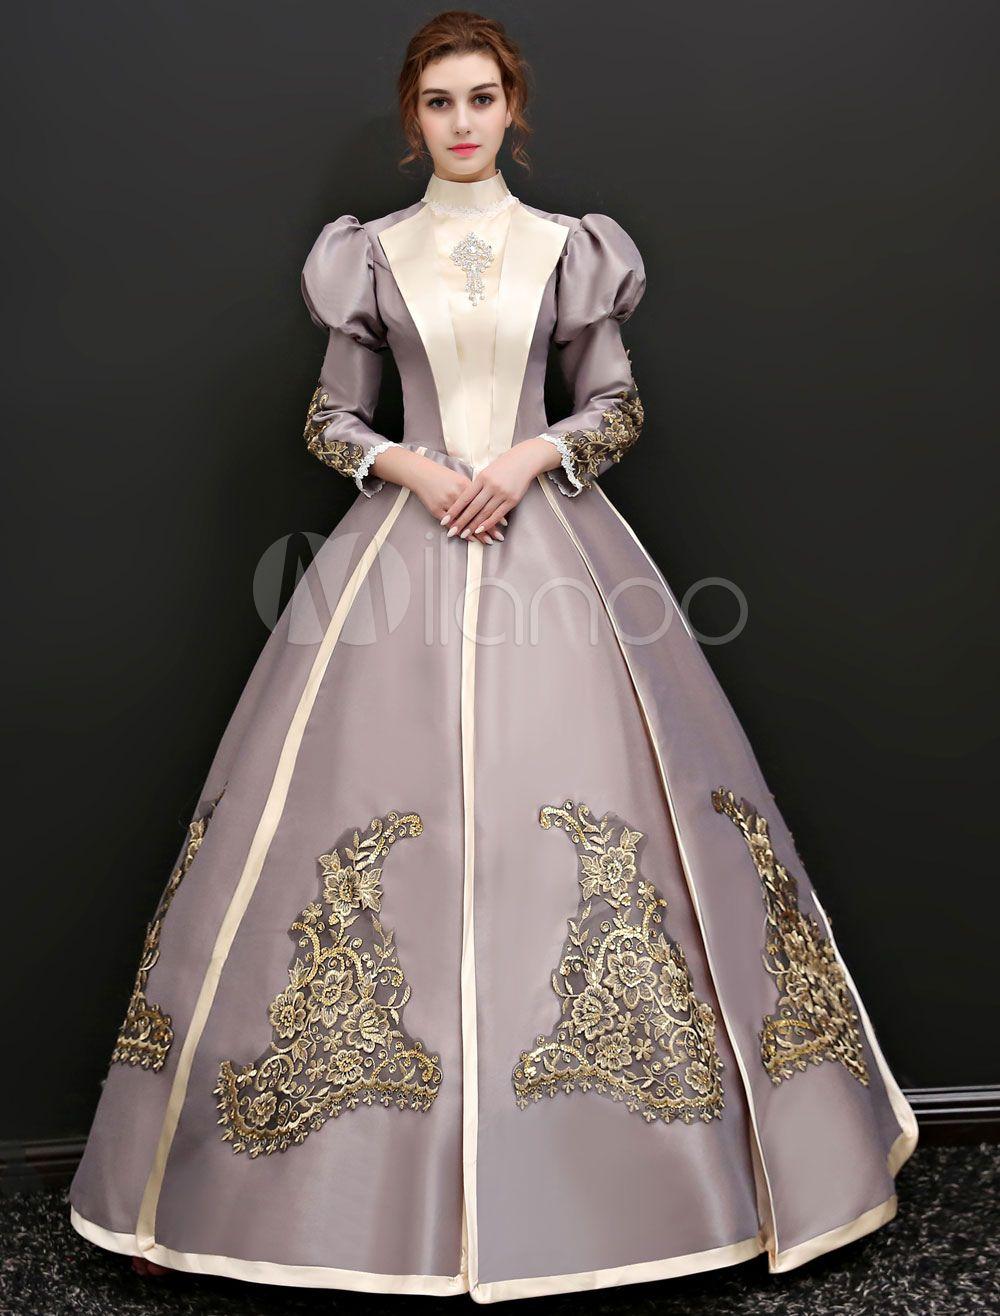 Victorian Era Costume Women 39 S Halloween Silver Grey Dresses Victorian Dress Costume Ball Gowns Vintage Gowns [ 1316 x 1000 Pixel ]